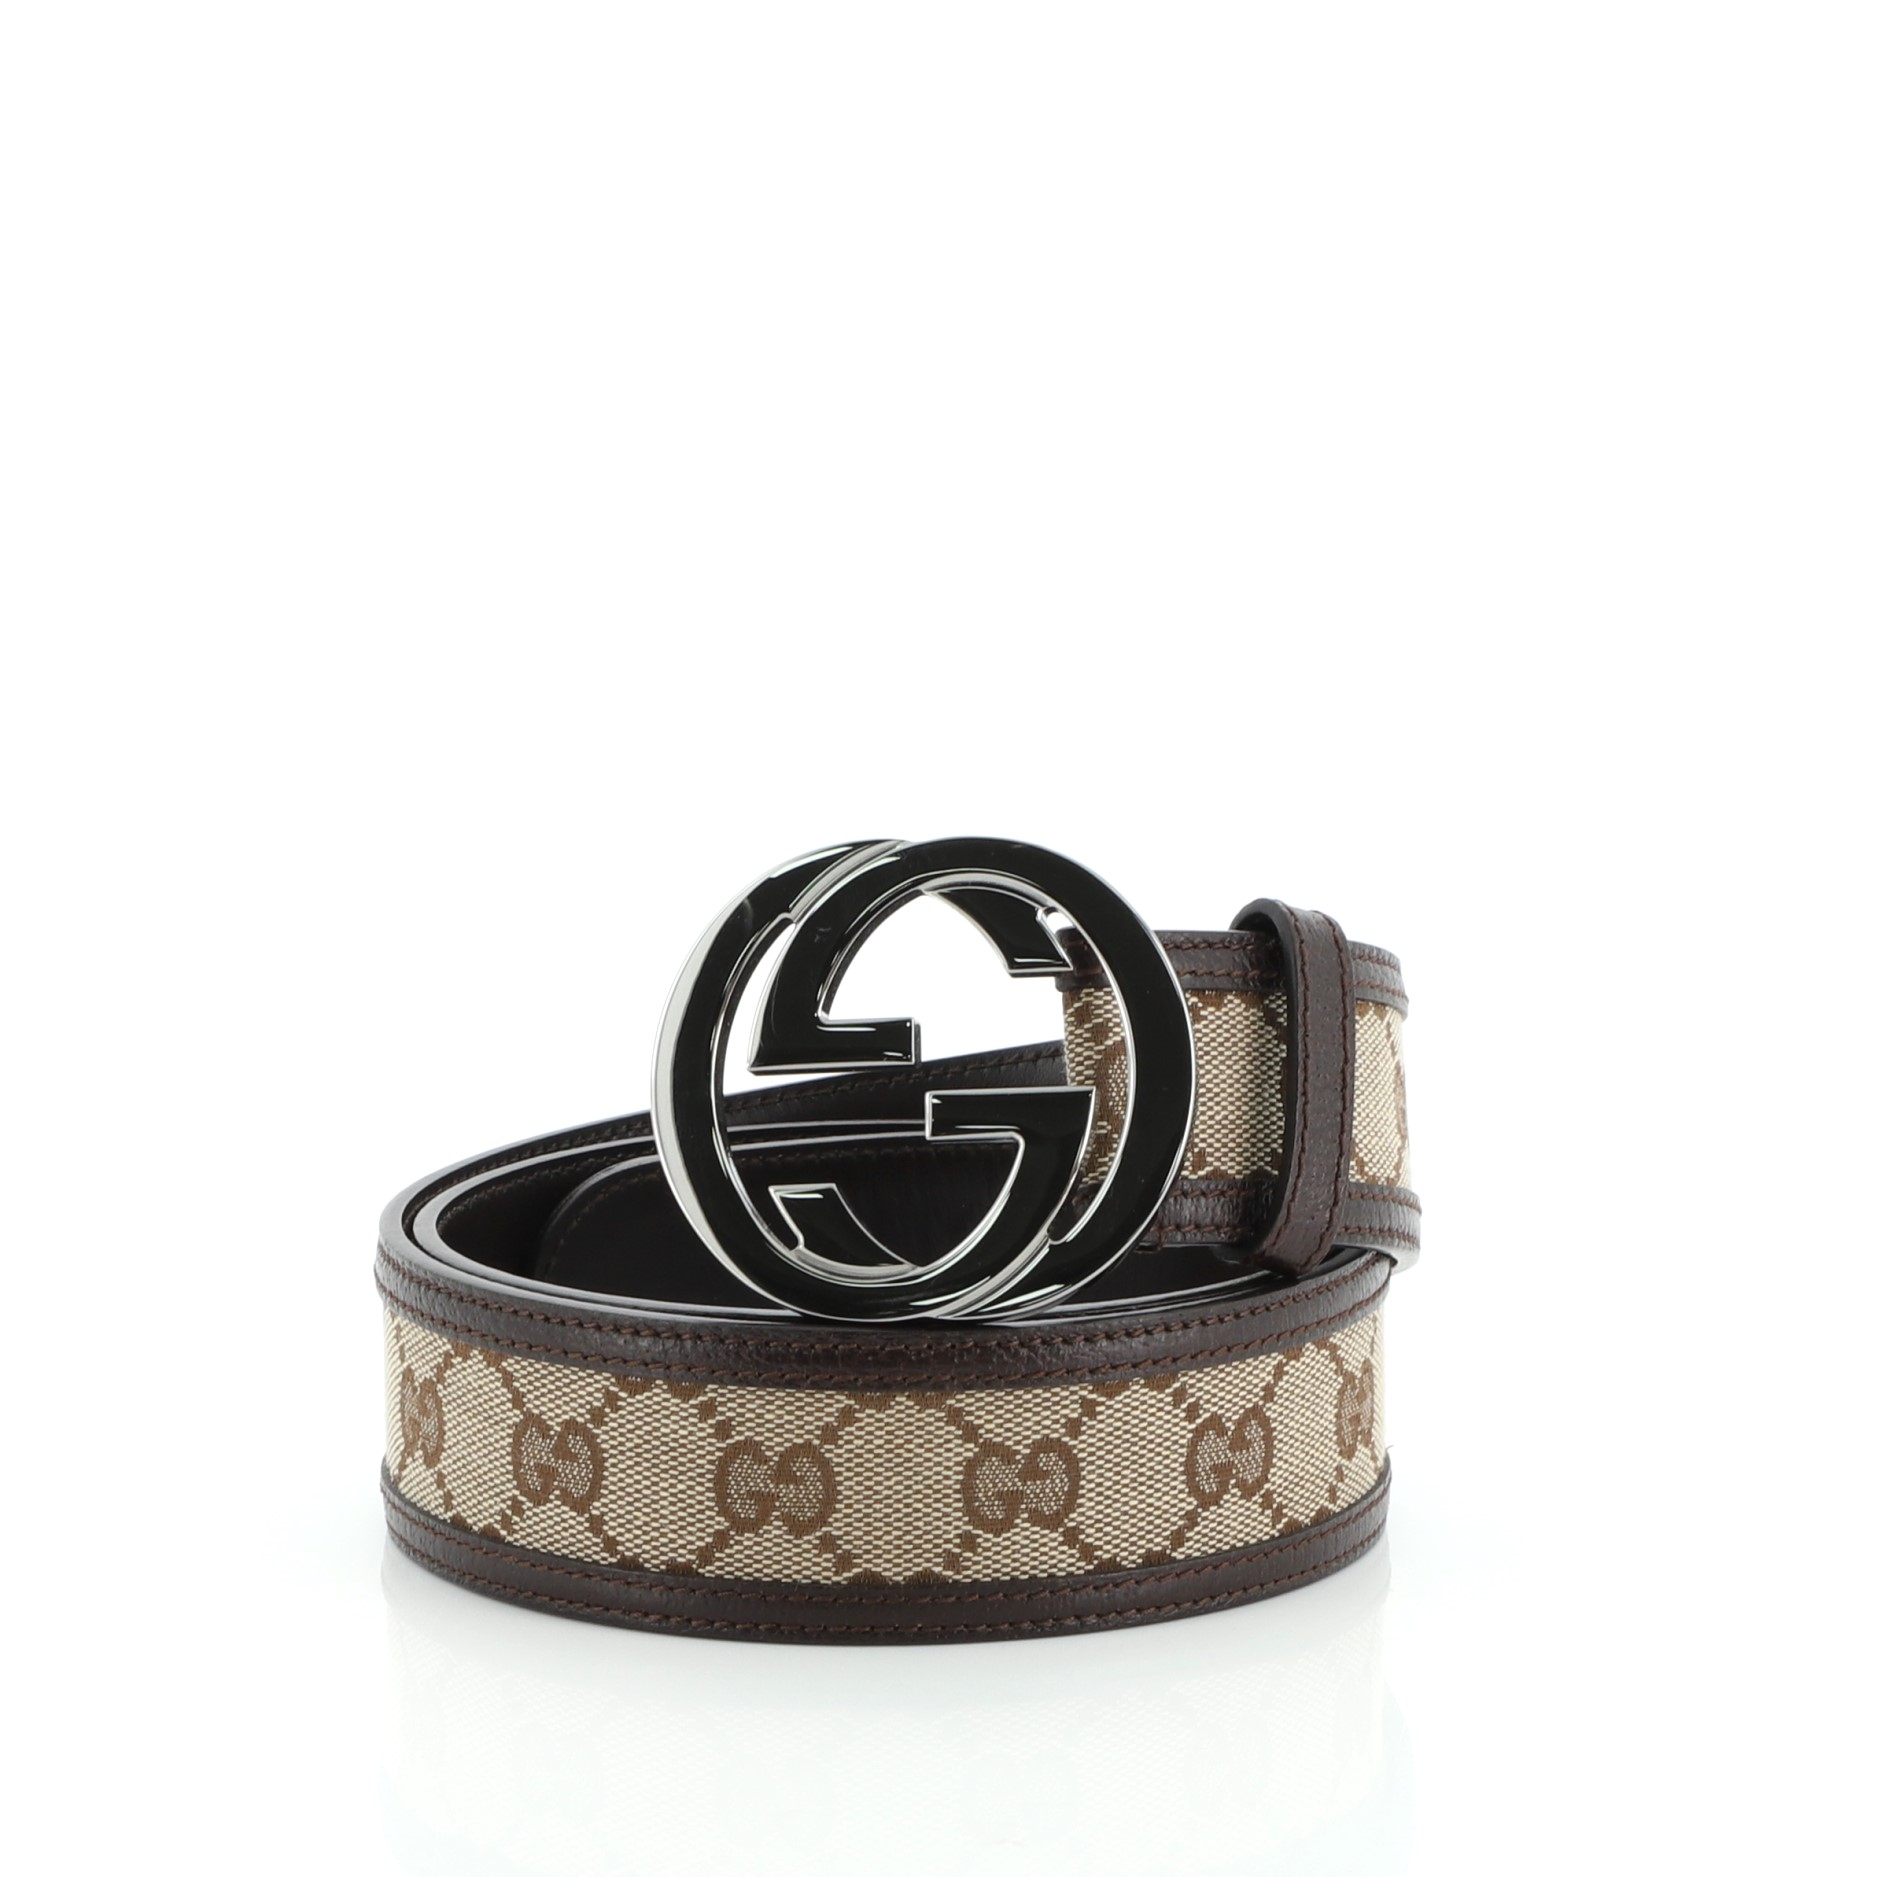 Designer Belts 101 Gucci GG Interlocking Belt